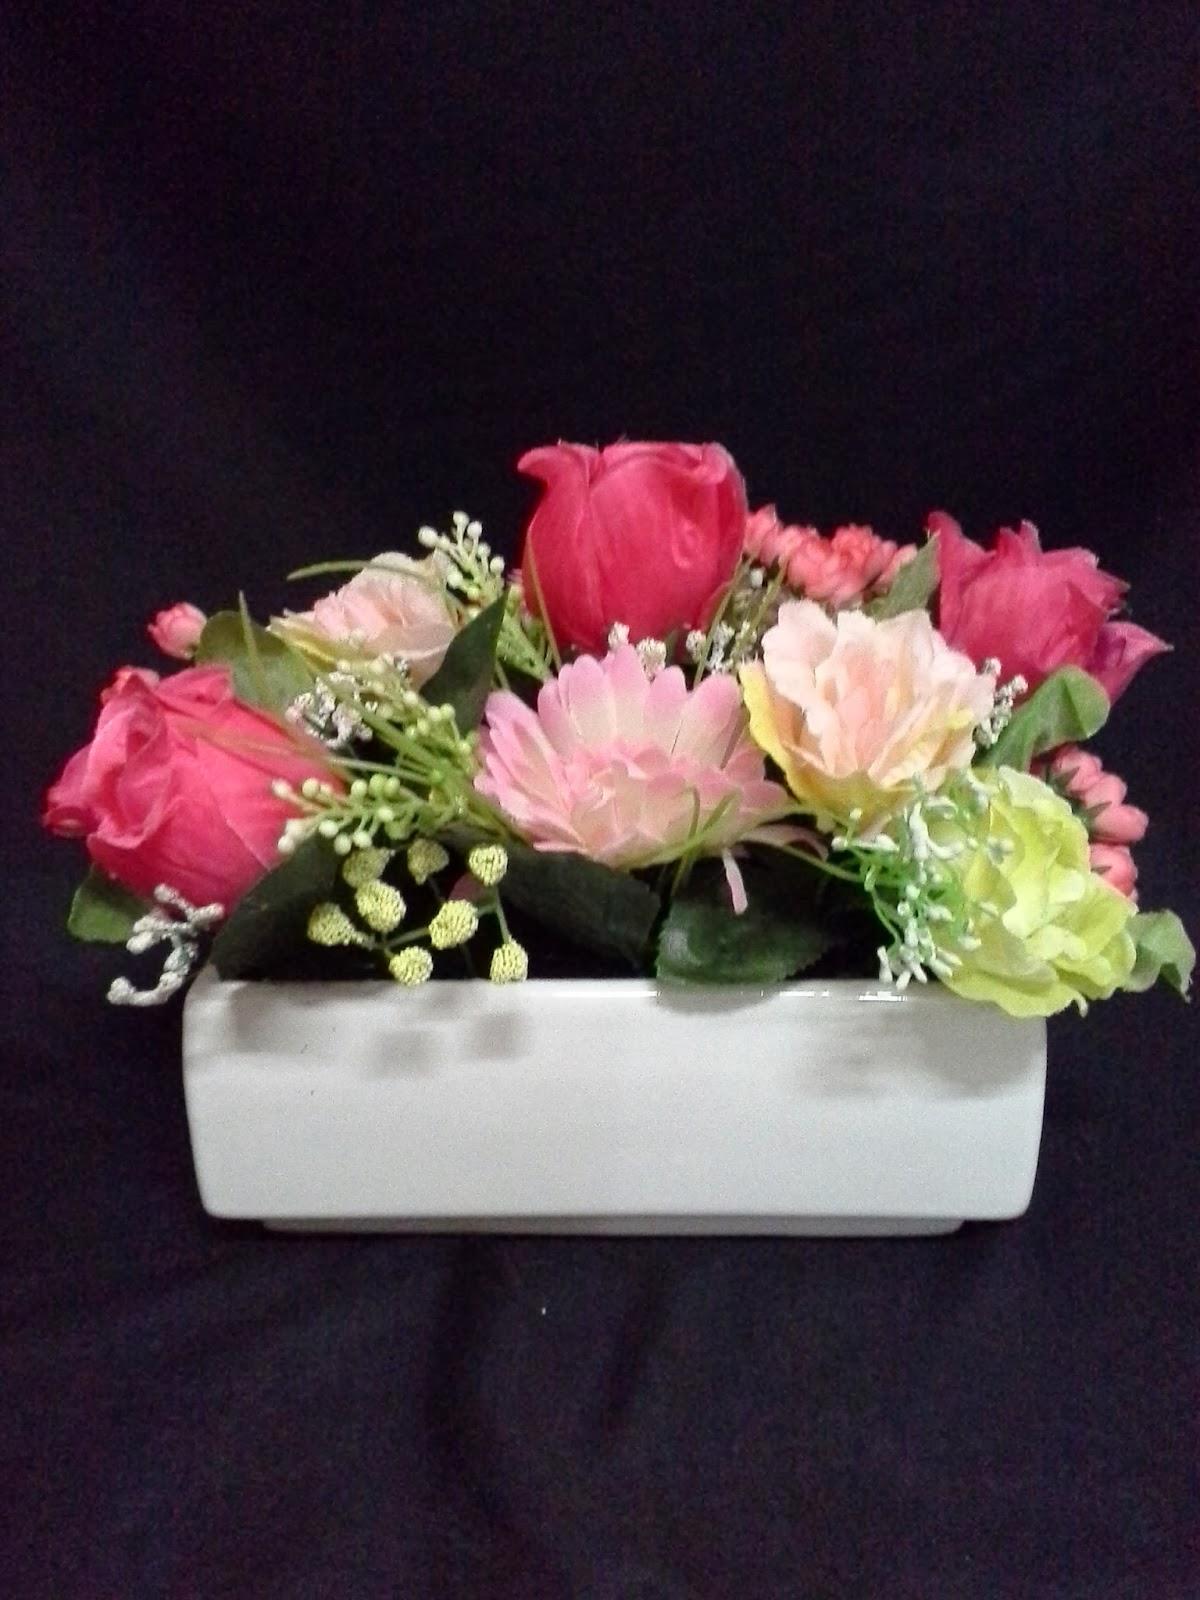 Sewa Rangkaian Bunga Artificial Sewa Rangkaian Bunga Artificial